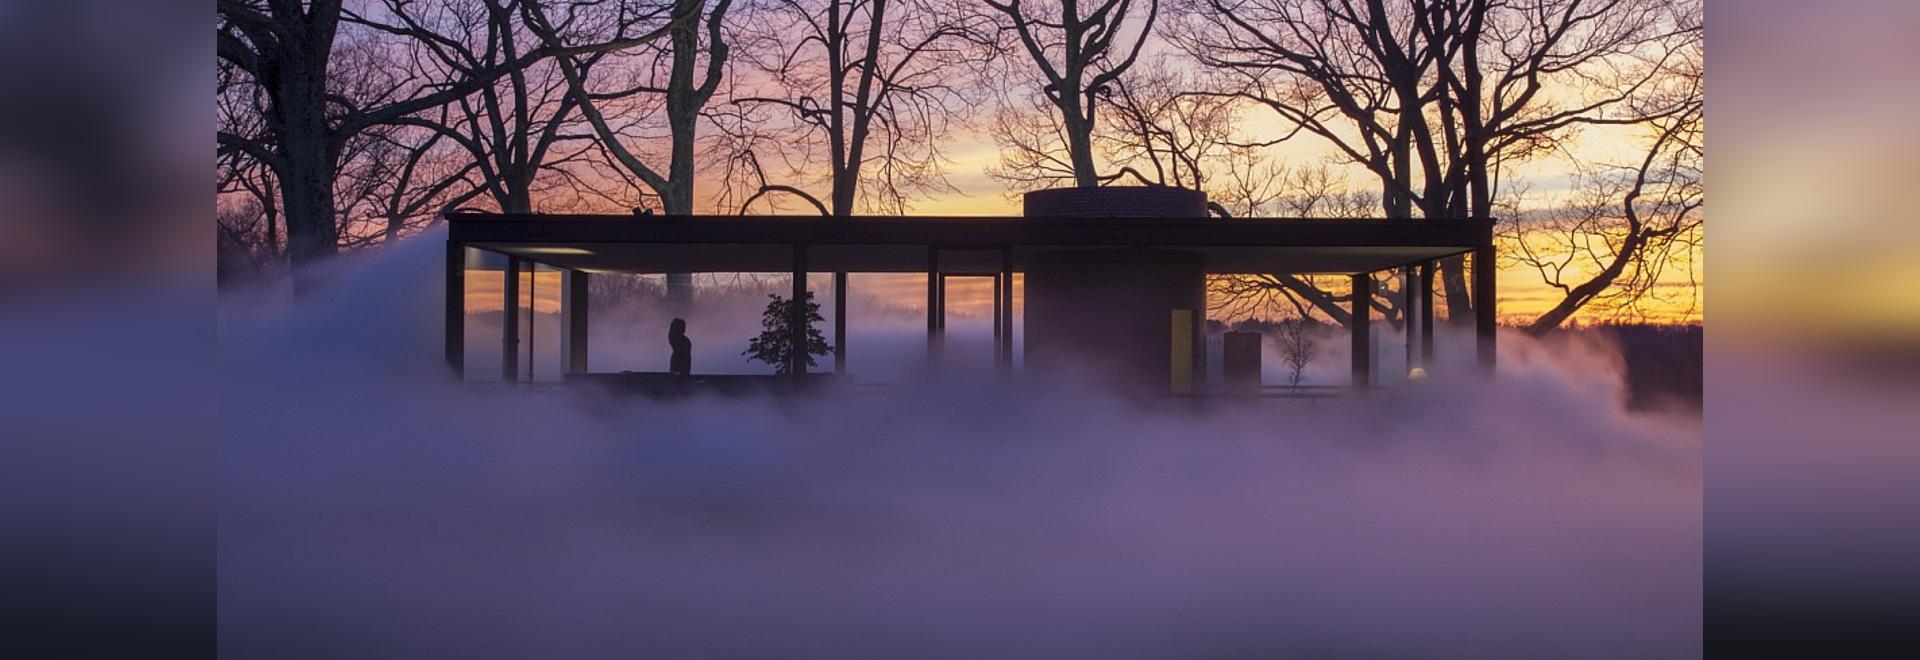 Künstler Fujiko Nakaya Shrouds Philip Johnsons Glashaus im Nebel. © Richard Barnes